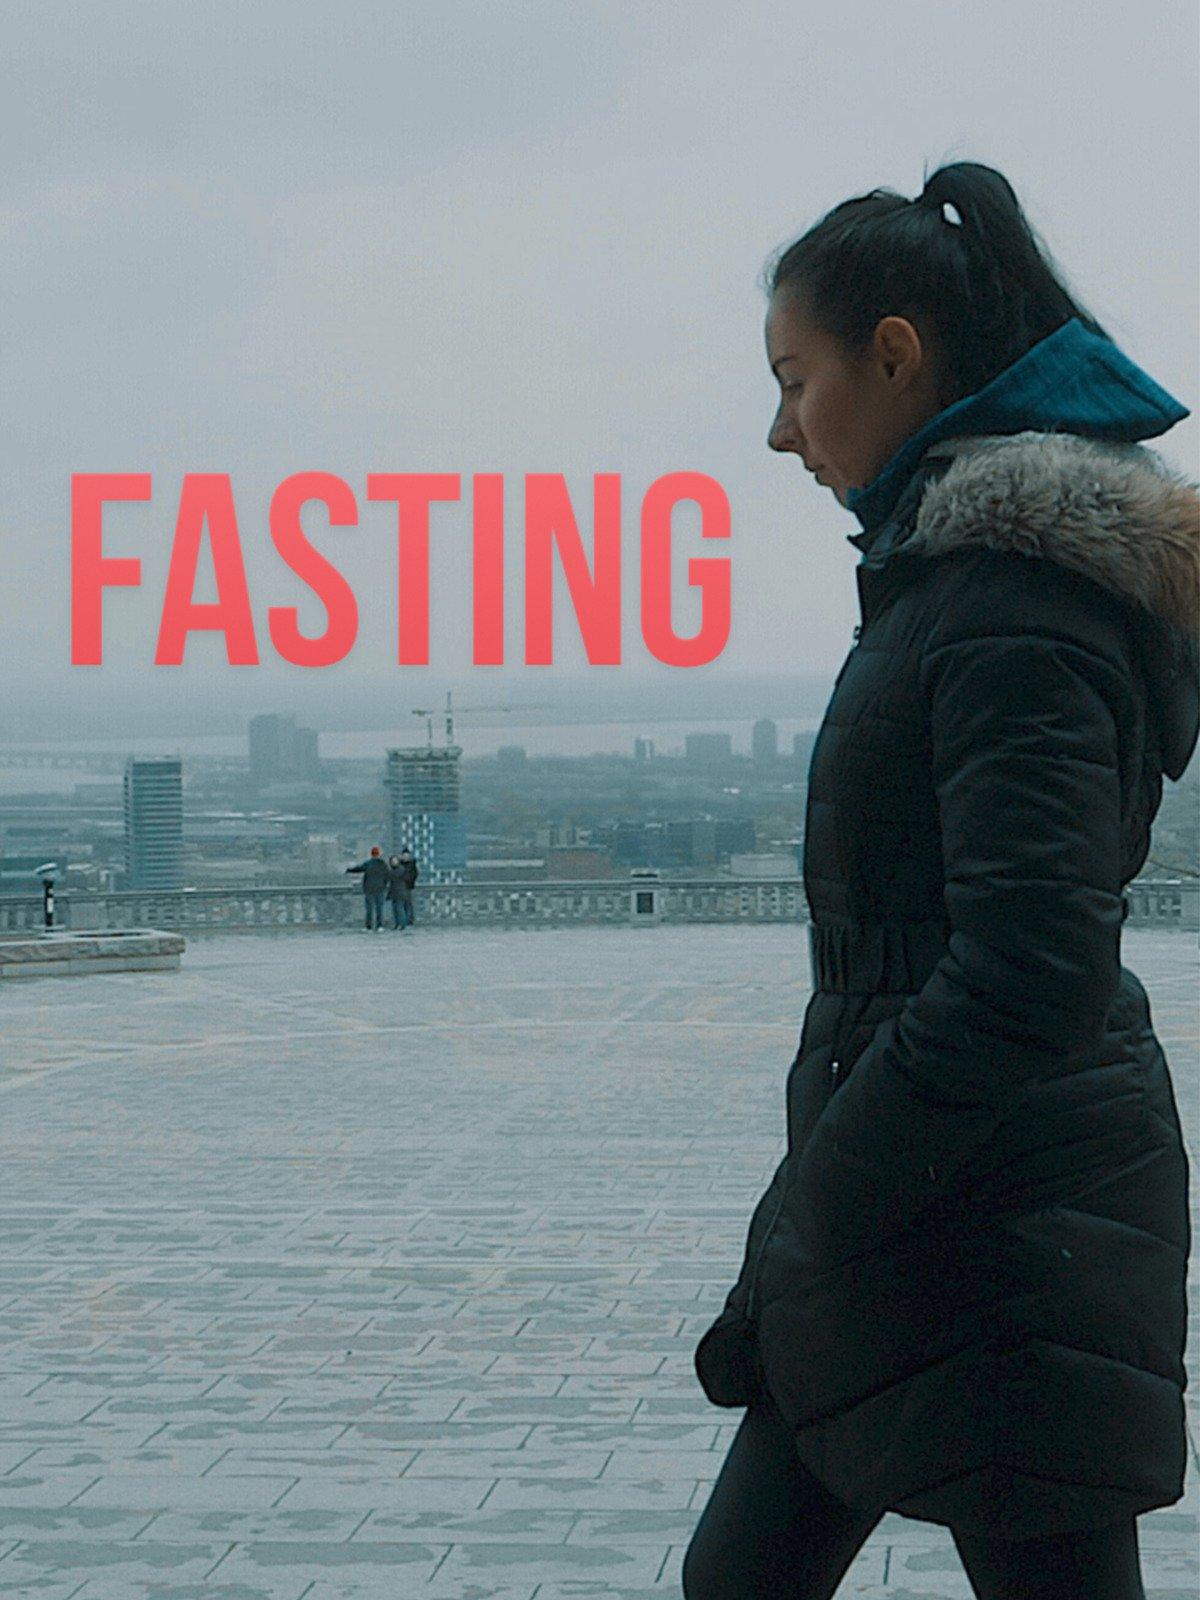 Health Shopping Fasting